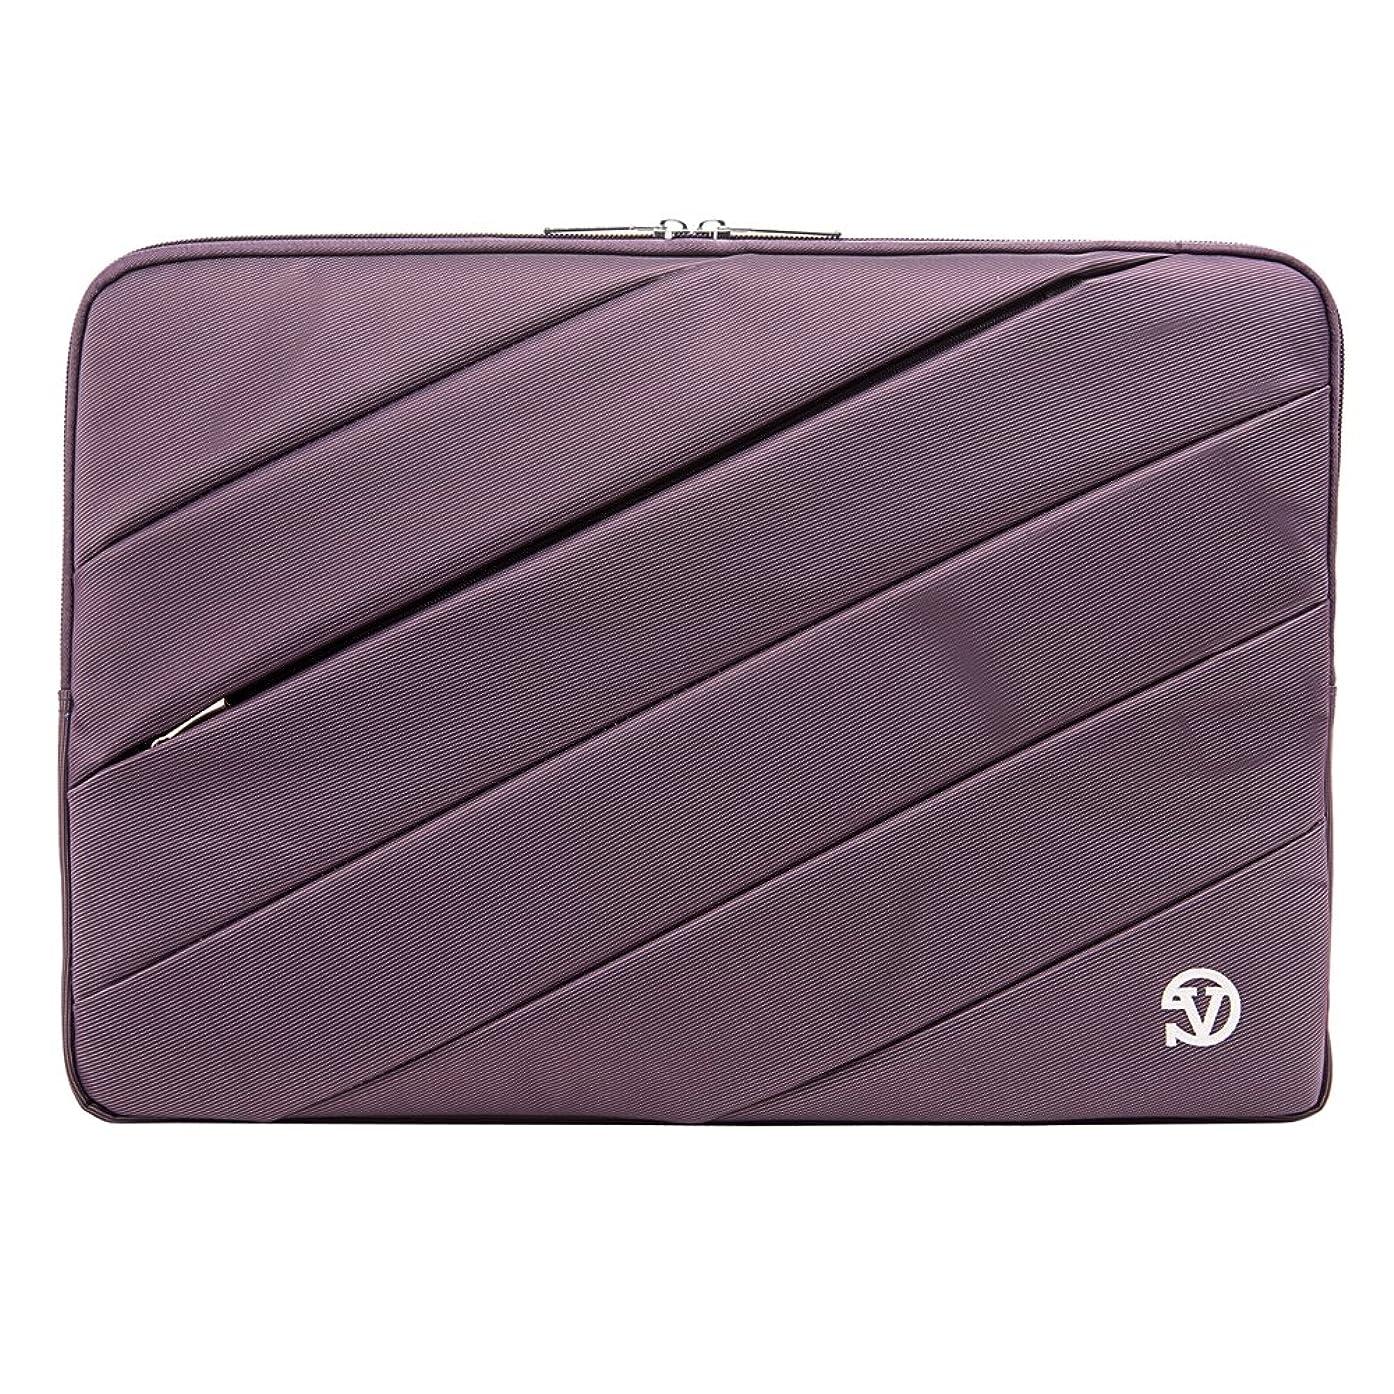 13.3inch Laptop Sleeve Case Messenger Bag Briefcase for Samsung Chromebook / Chromebook 3 / ATIV / Notebook 9 / Acer Chromebook / Asus Chromebook / E / ZenBook / Google Chromebook / Microsoft Surface